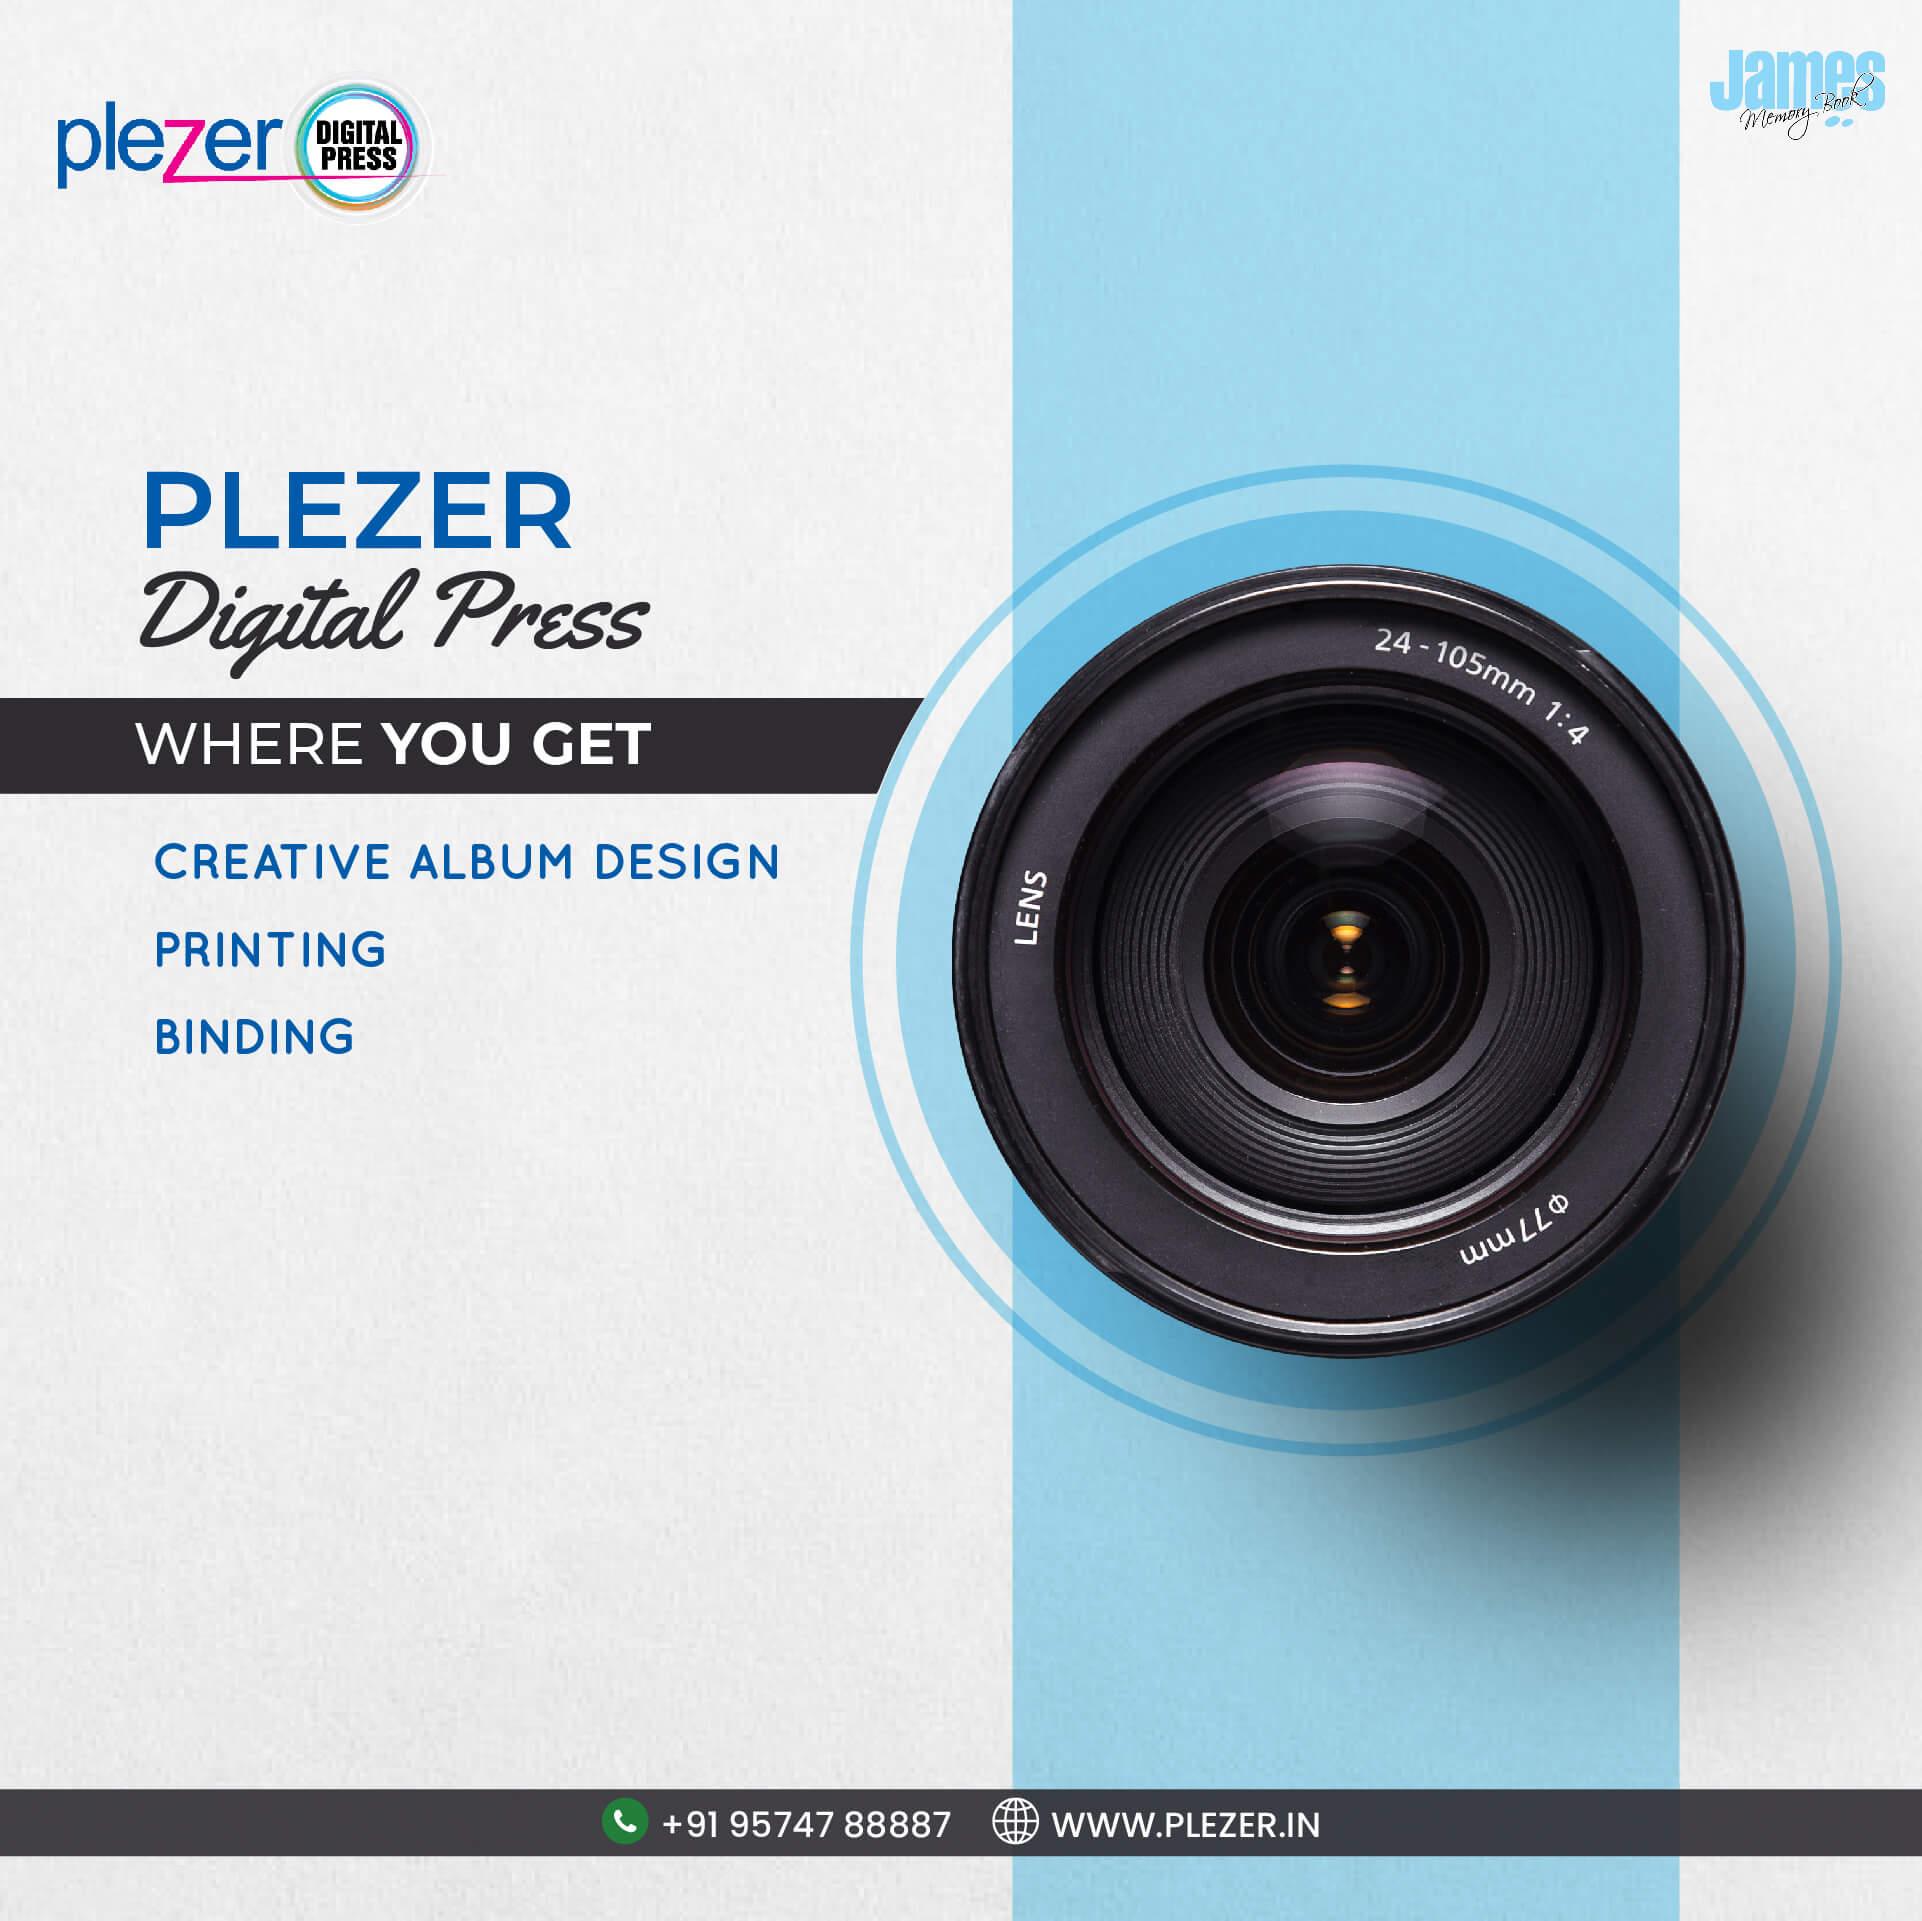 plezer digital press 1